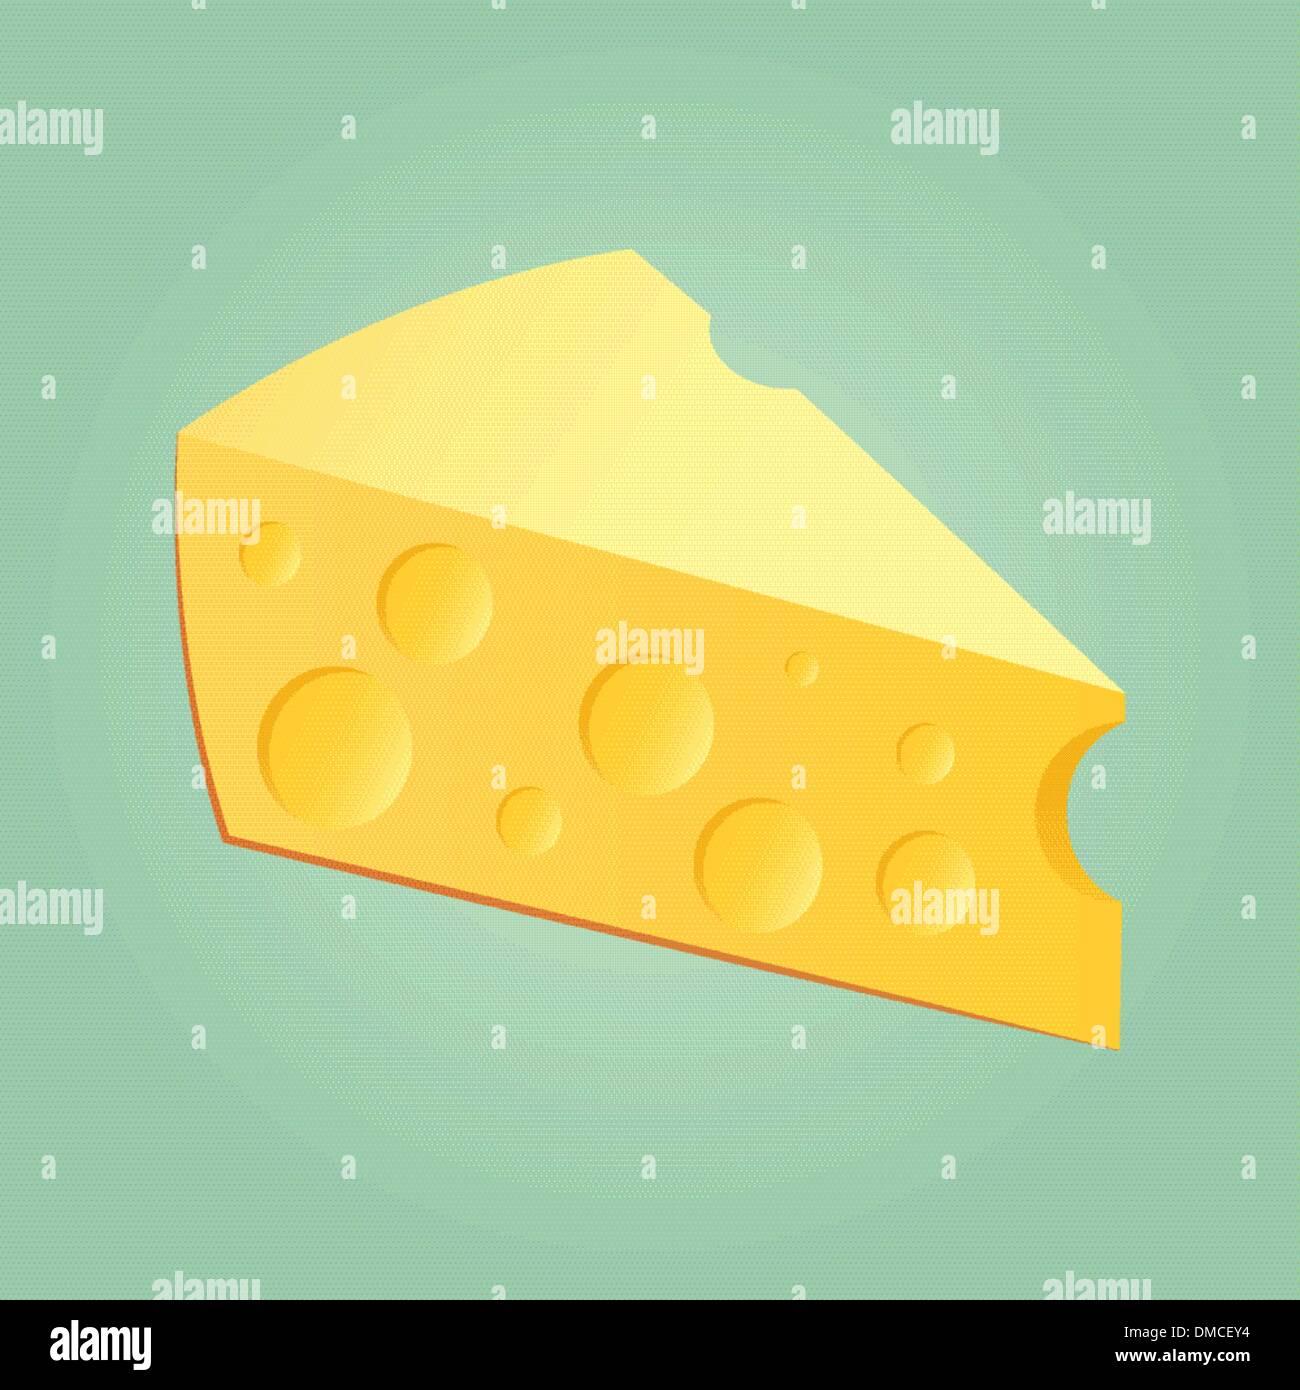 Platte aus KäseStock Vektor